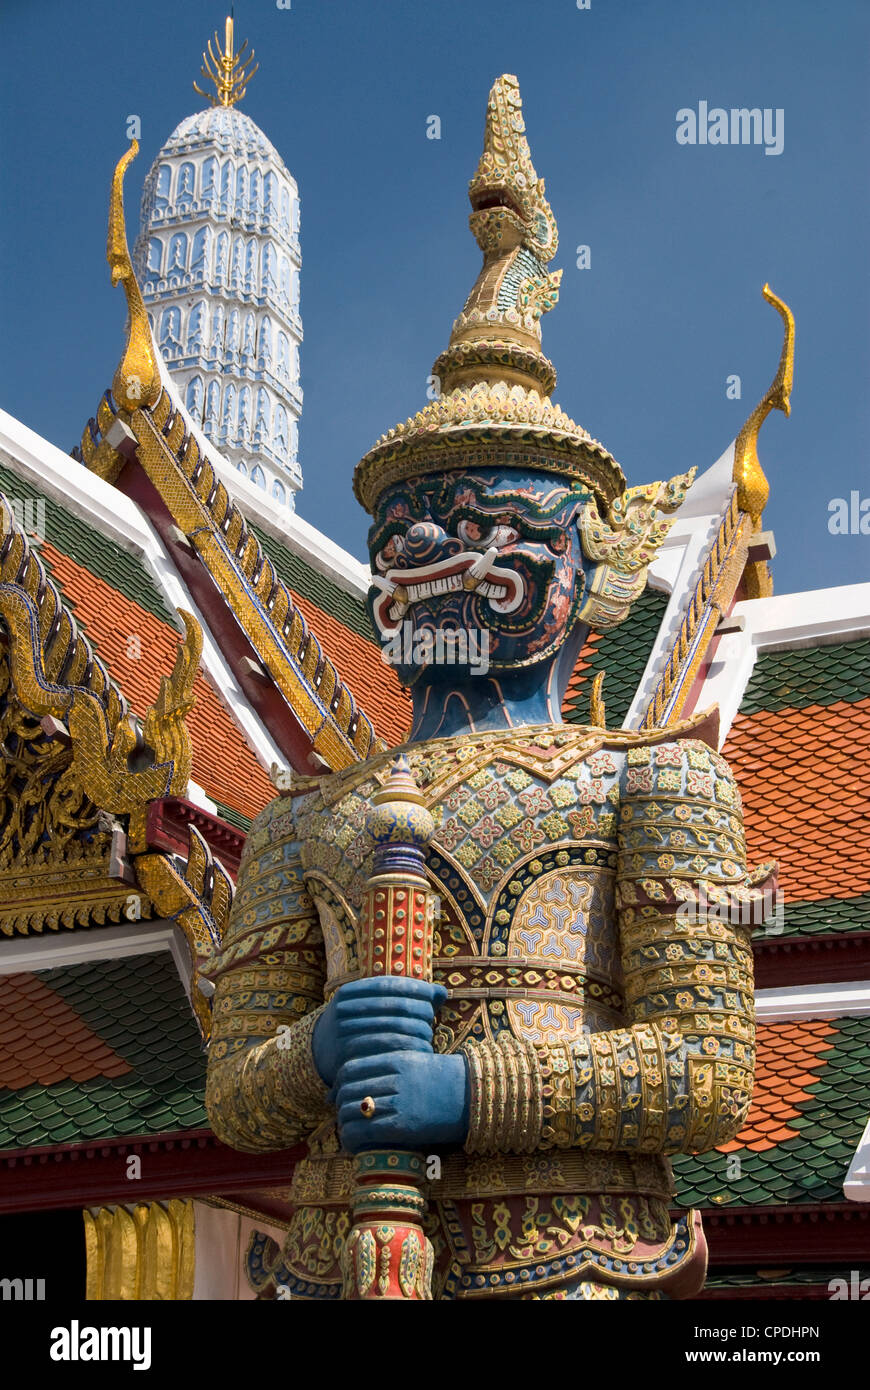 Statue of demon guardian, Wat Phra Kaeo Complex (Grand Palace Complex), Bangkok, Thailand, Southeast Asia, Asia - Stock Image